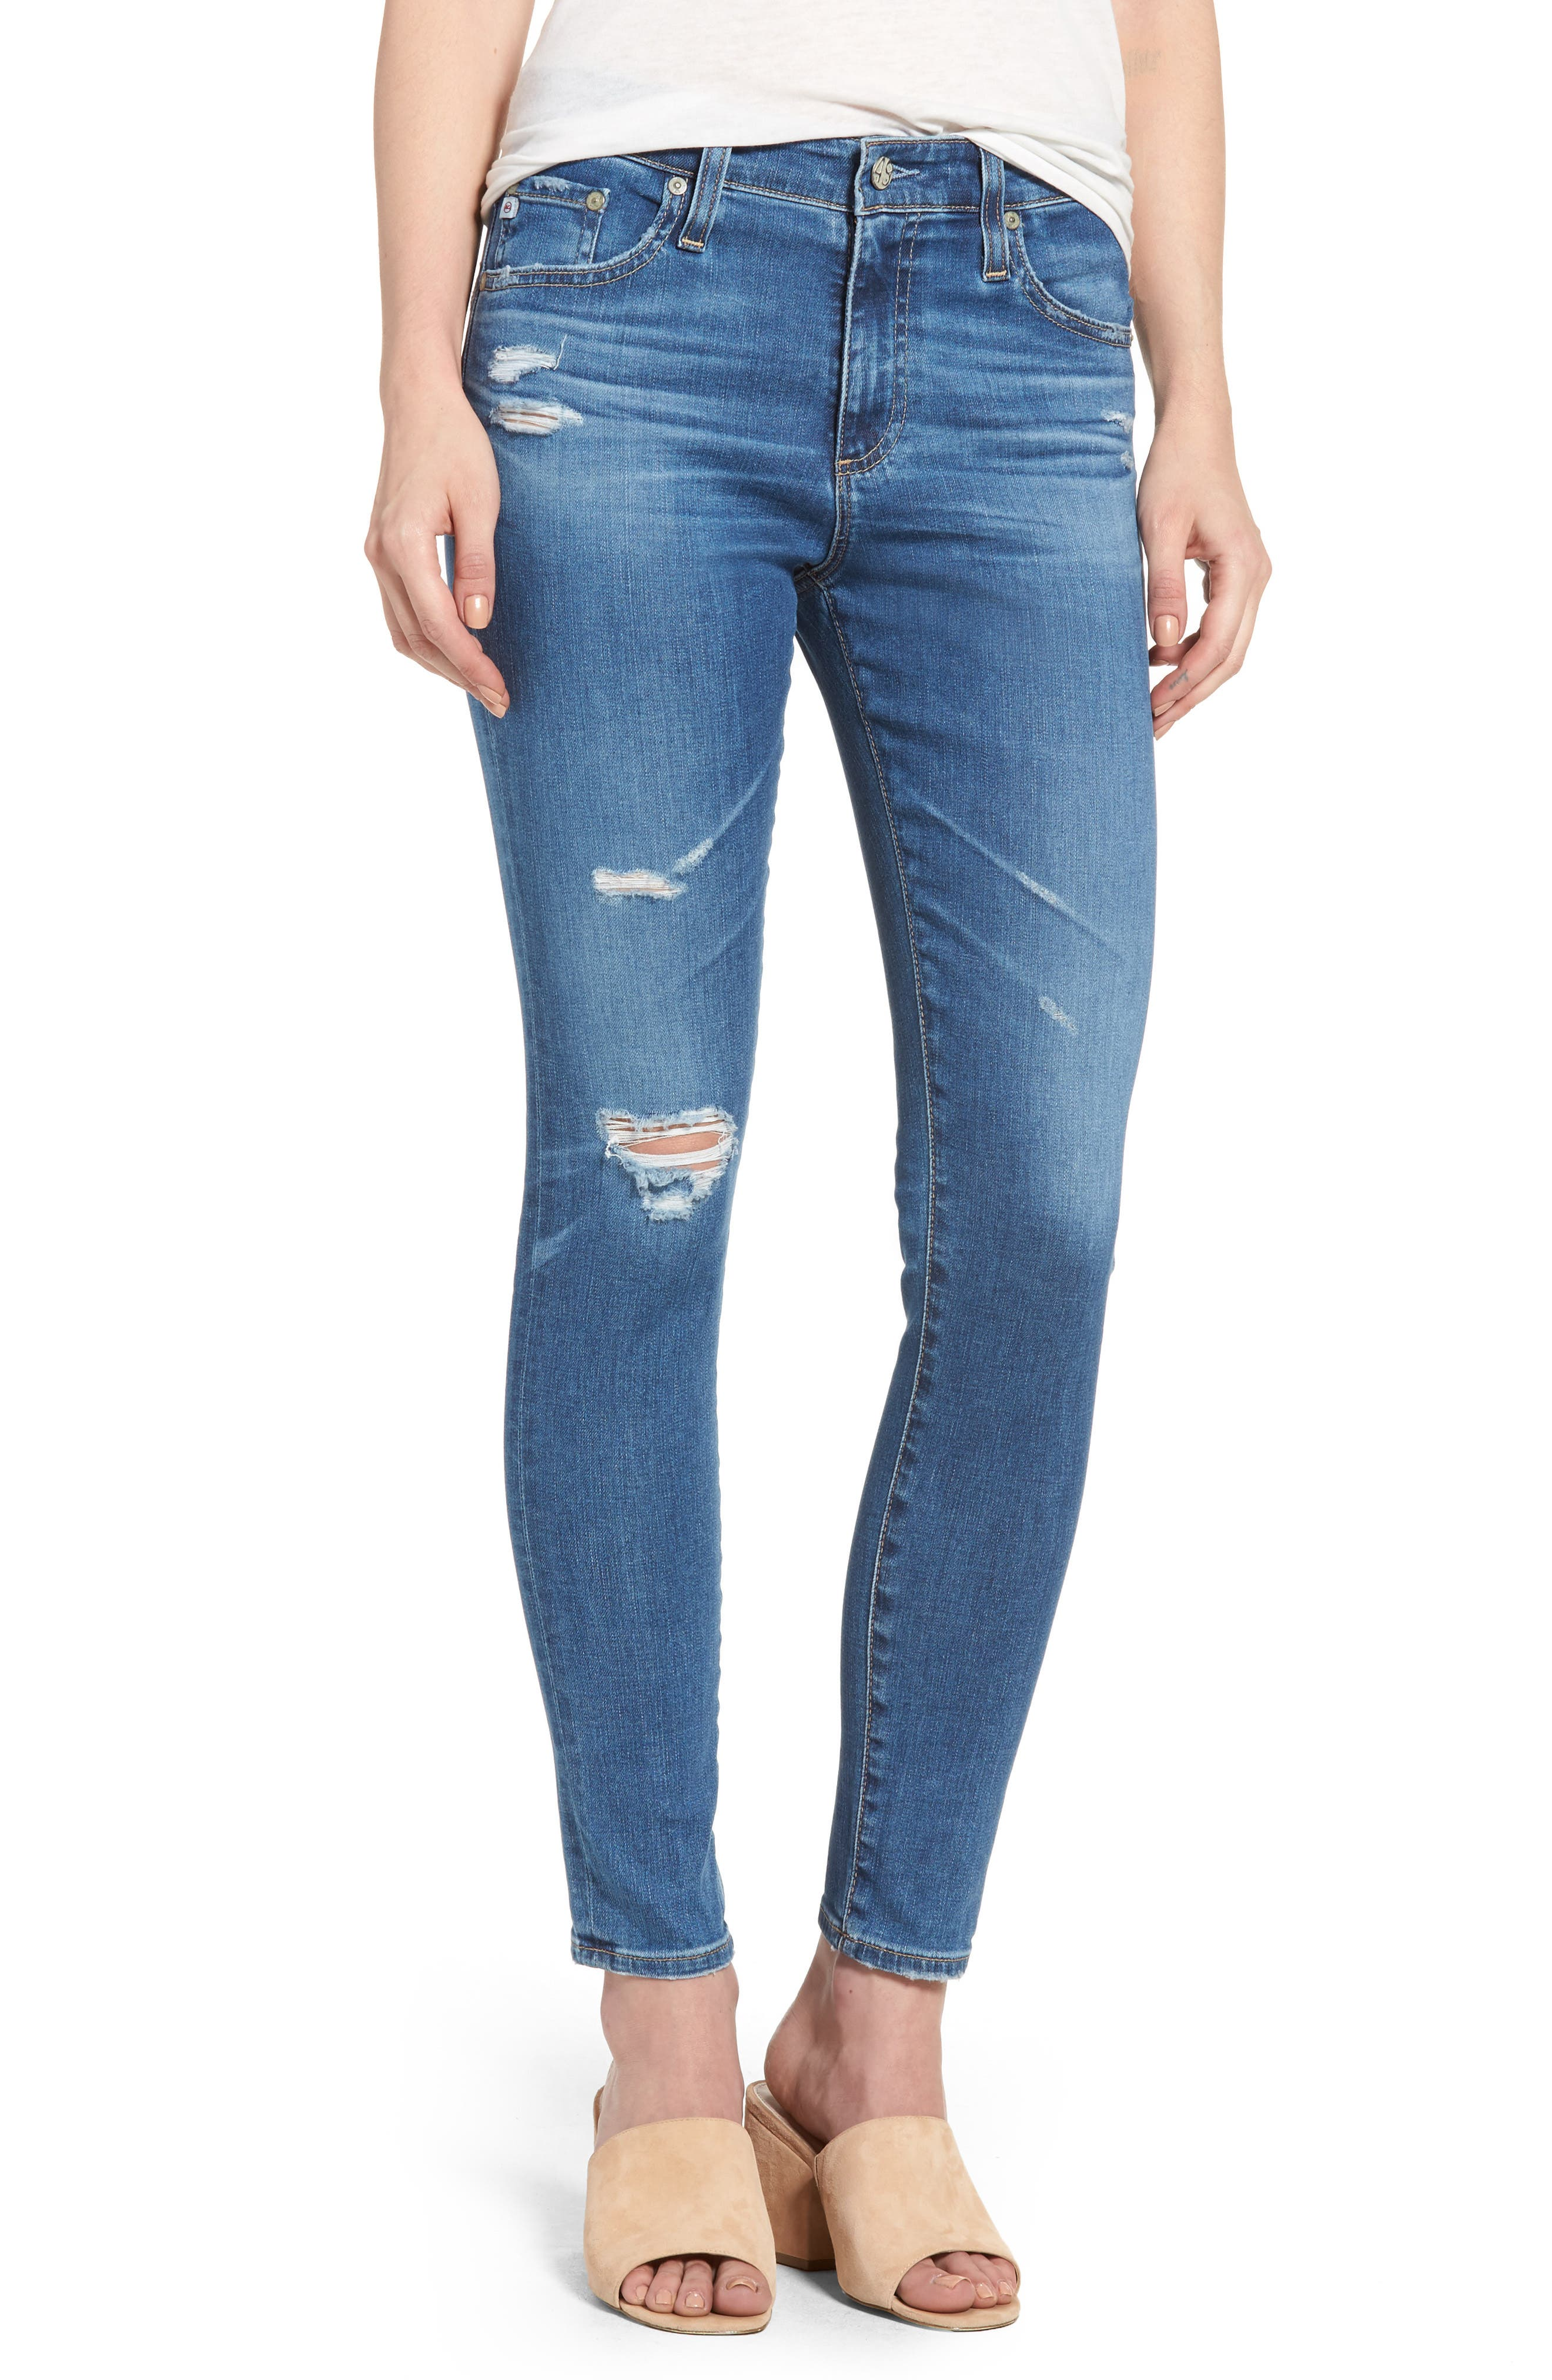 Main Image - AG The Farrah High Waist Ankle Skinny Jeans (14 Year Blue Nile Destructed)